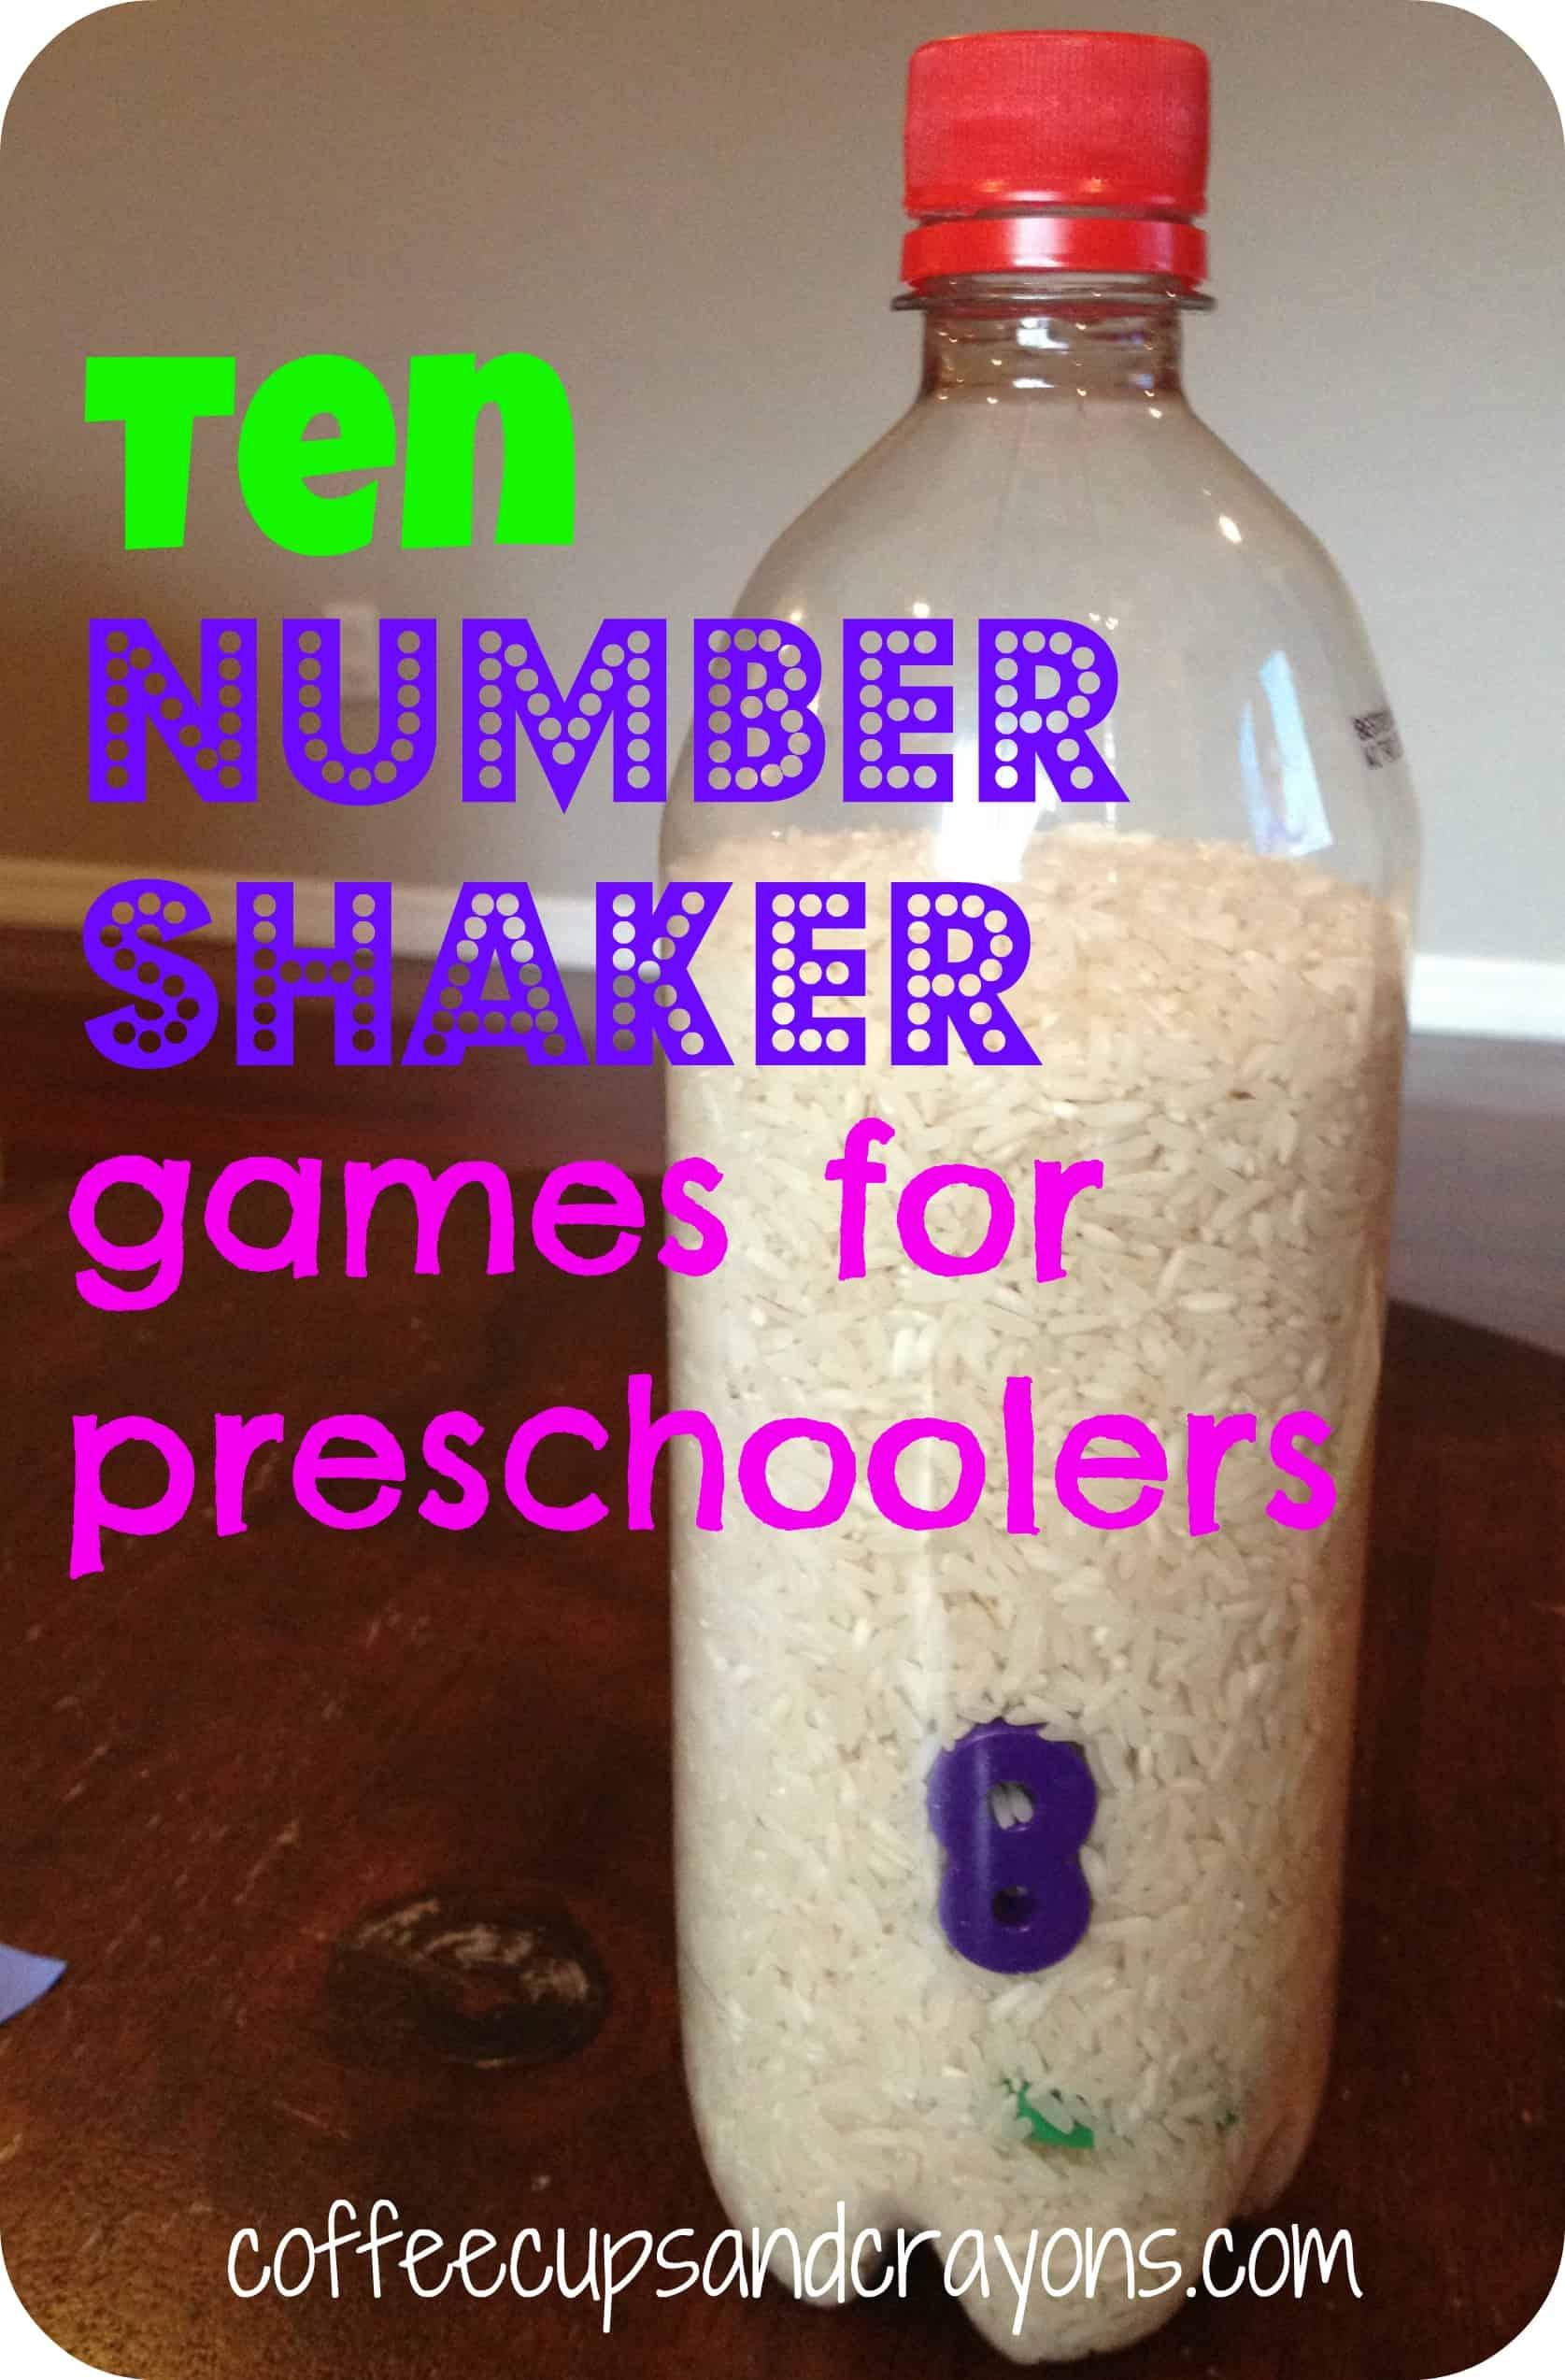 10 Fun Number Shaker Games For Preschoolers